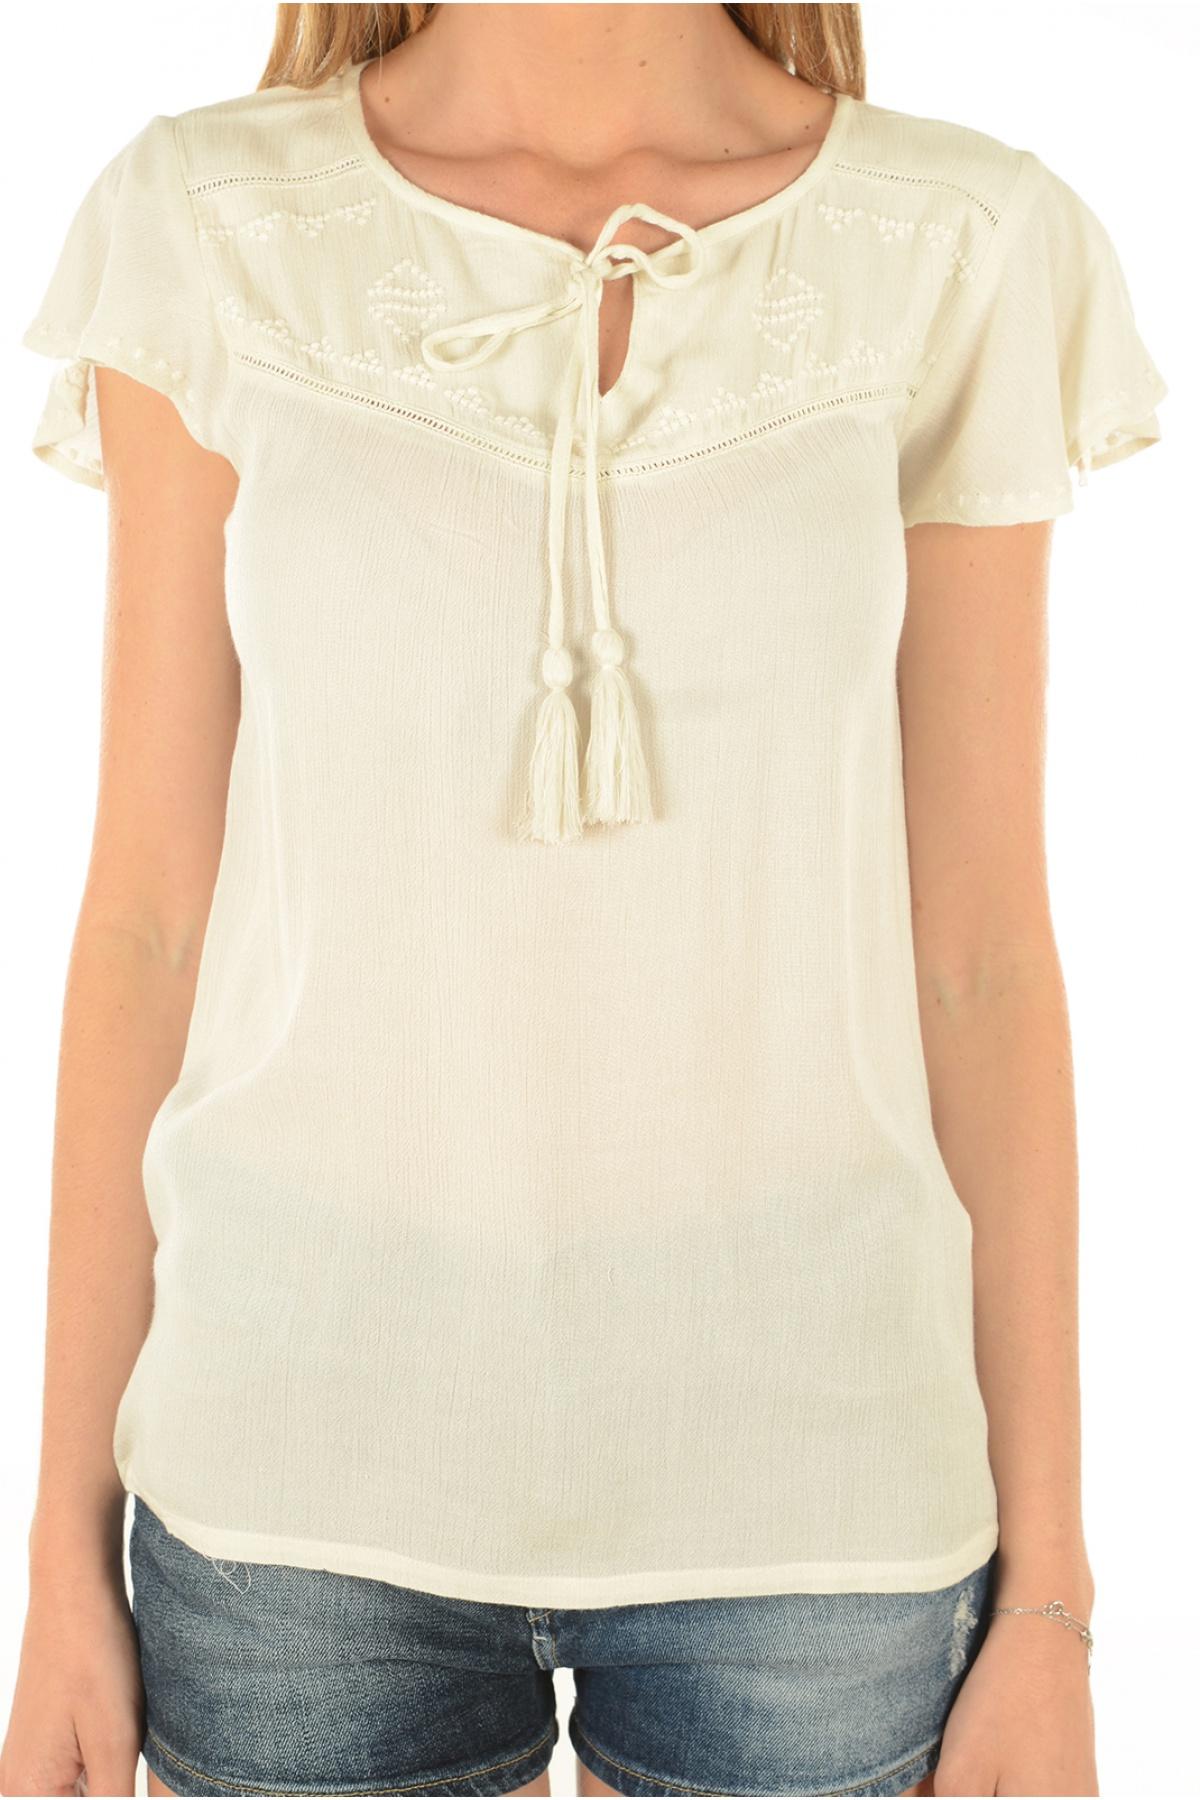 Tops & Tee shirts Kaporal Femme Xs,s,m,l